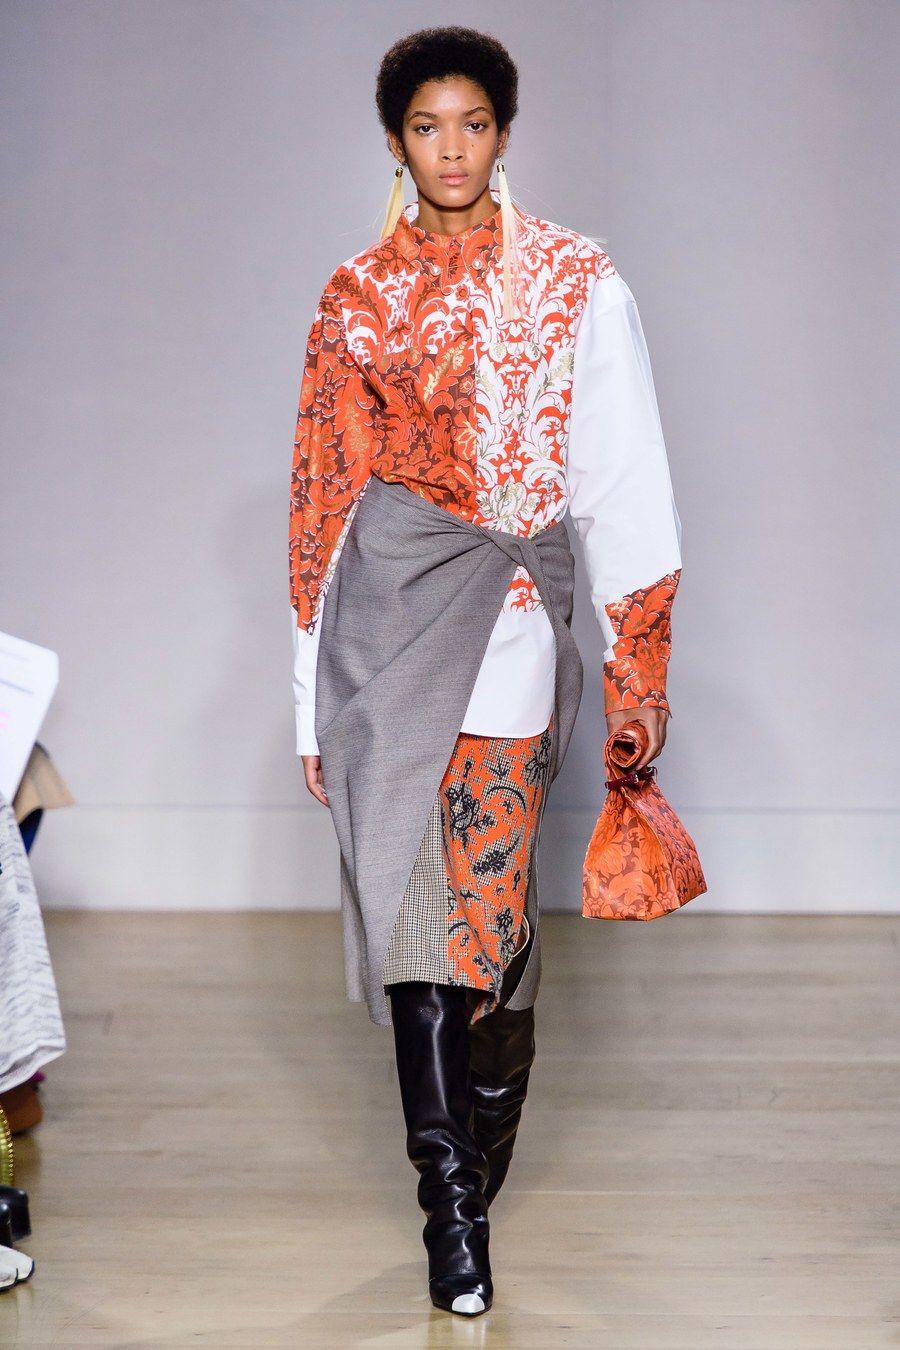 Ports 1961 Fall 2019 Ready-to-Wear Fashion Show